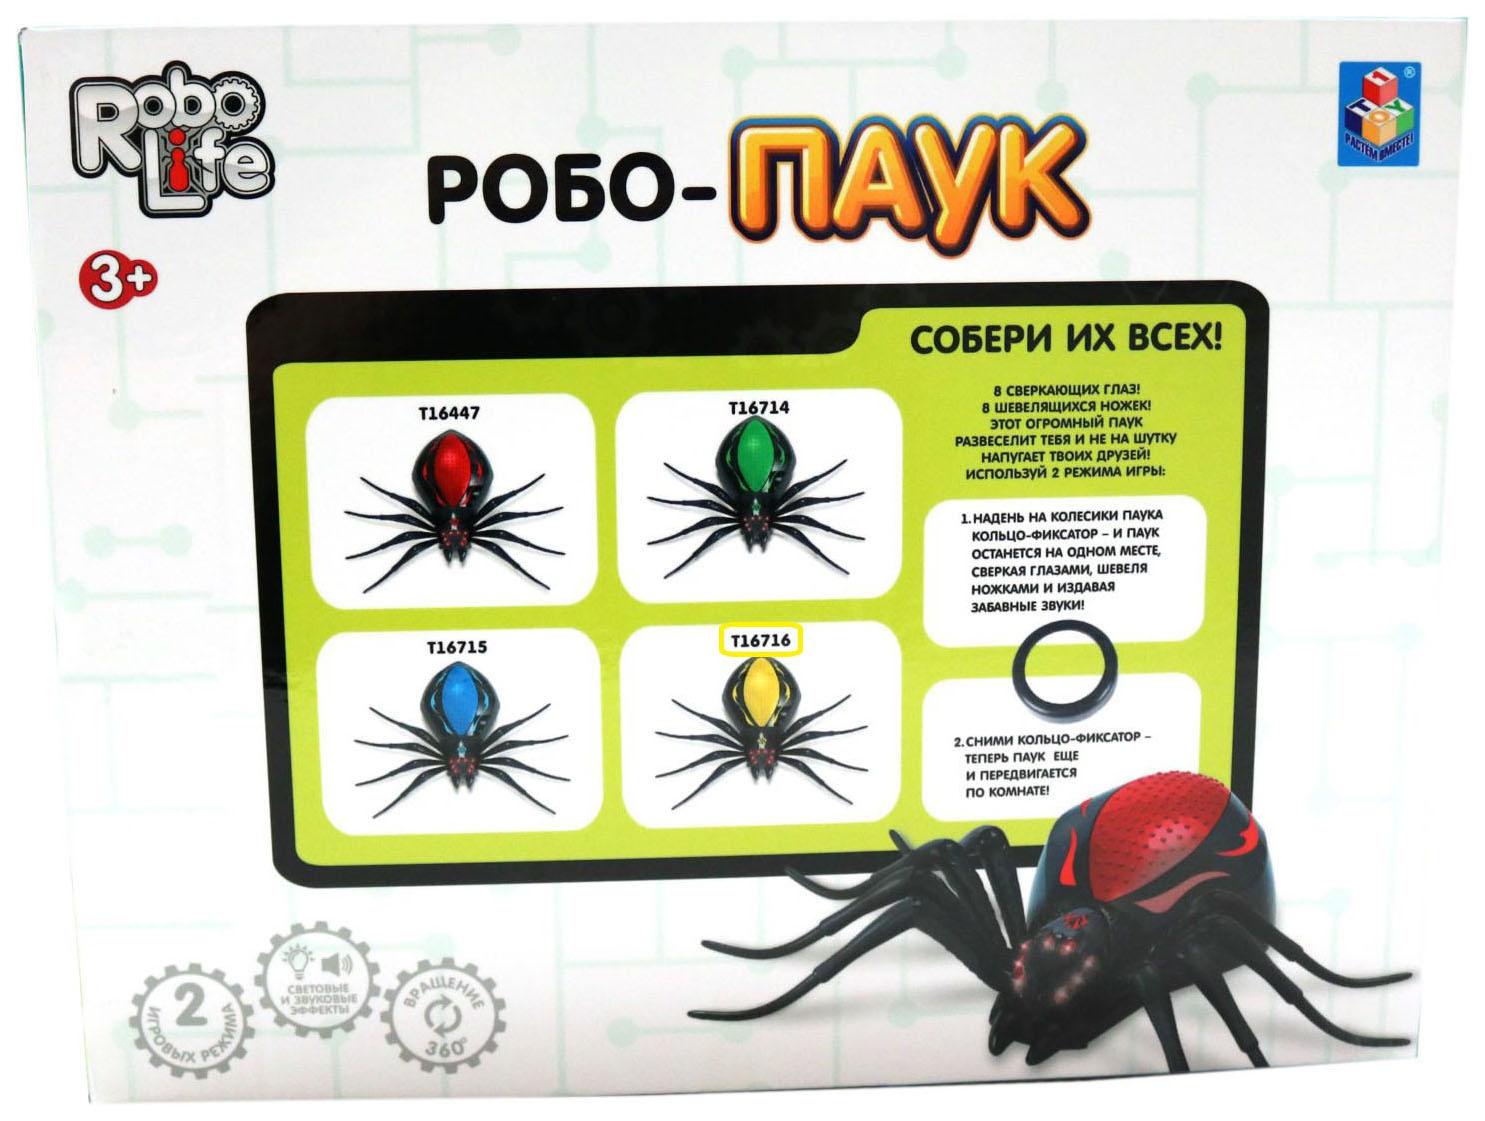 Купить Интерактивная игрушка 1TOY Robo Life Робо-паук Т16716 чёрно-желтый, 1 TOY, Интерактивные игрушки